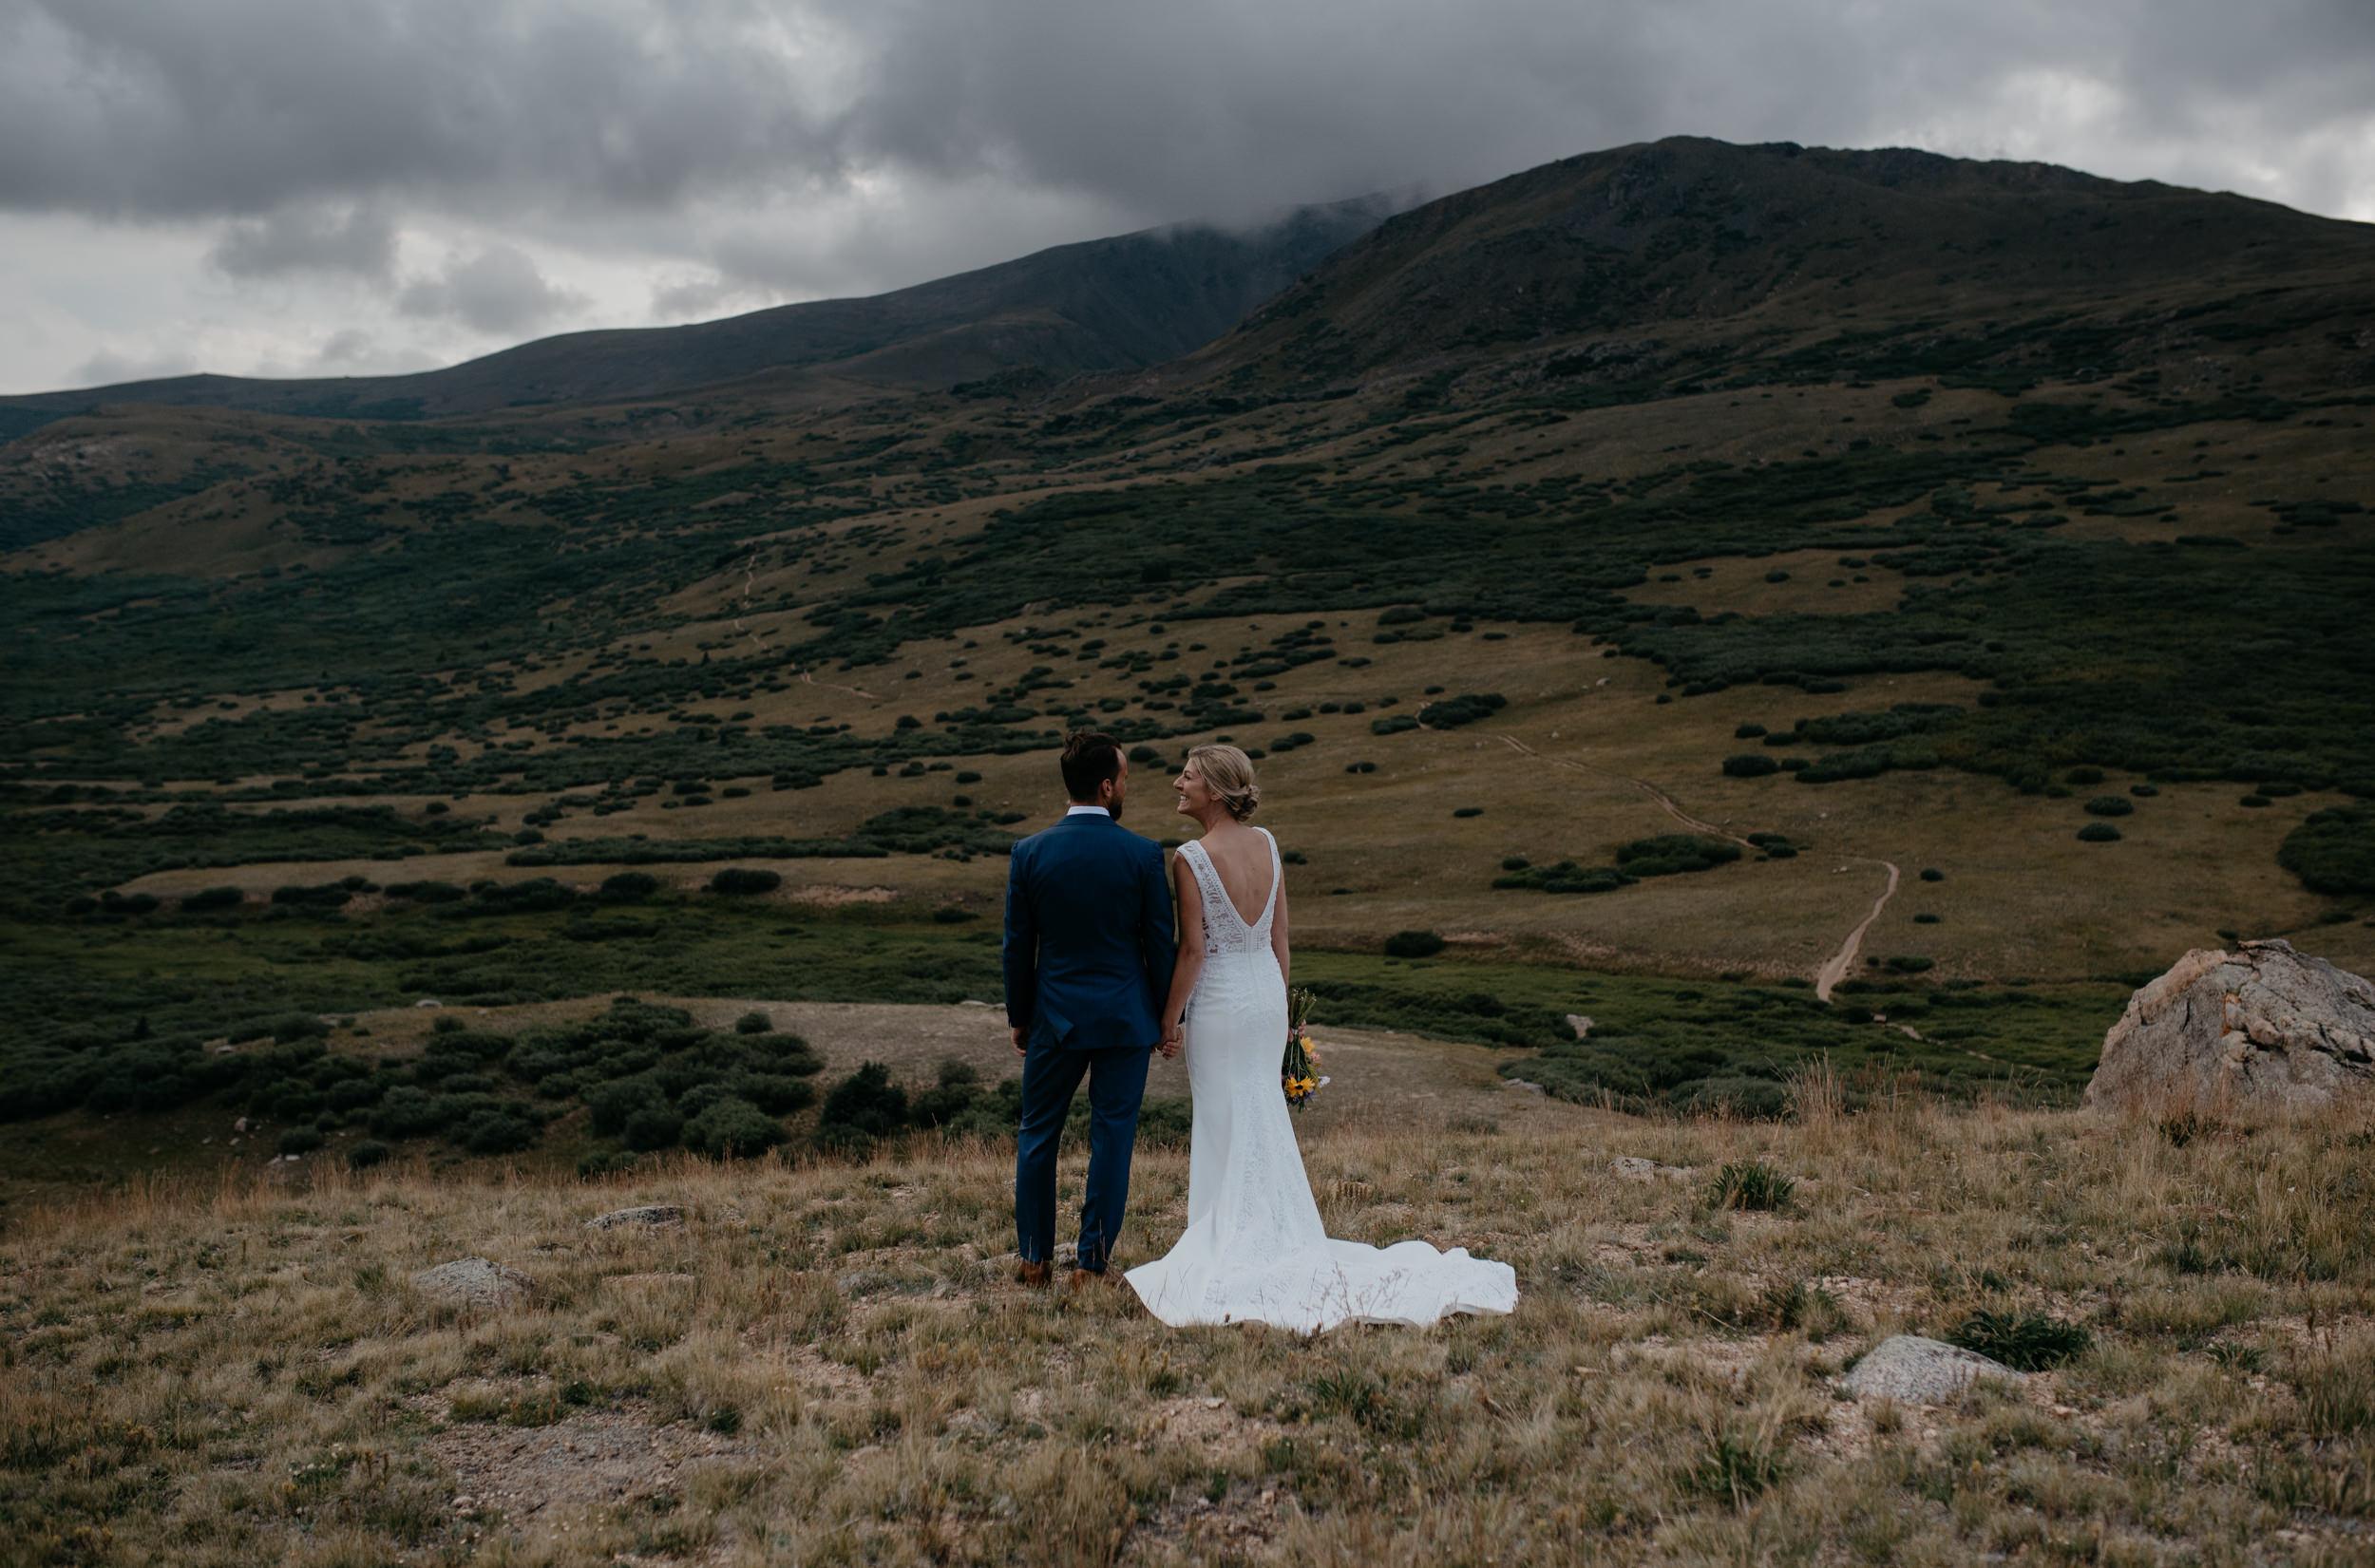 Guanella Pass, a Colorado elopement location